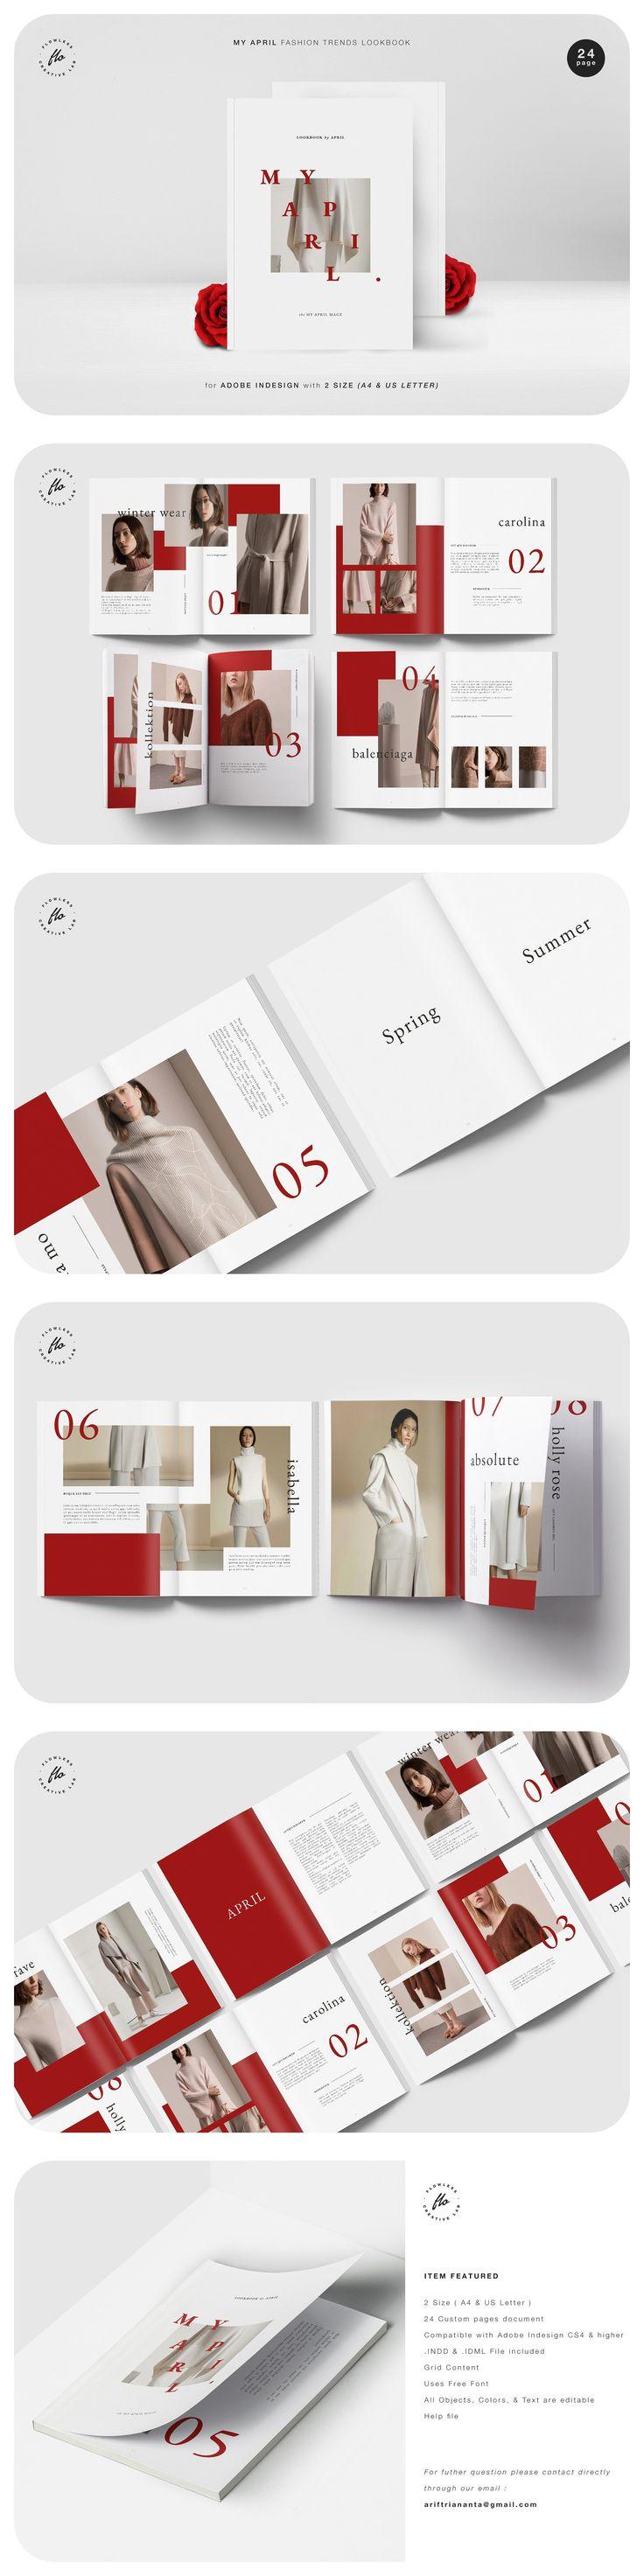 My April - Fashion Lookbook/Magazine Template. A fully editable magazine templat...